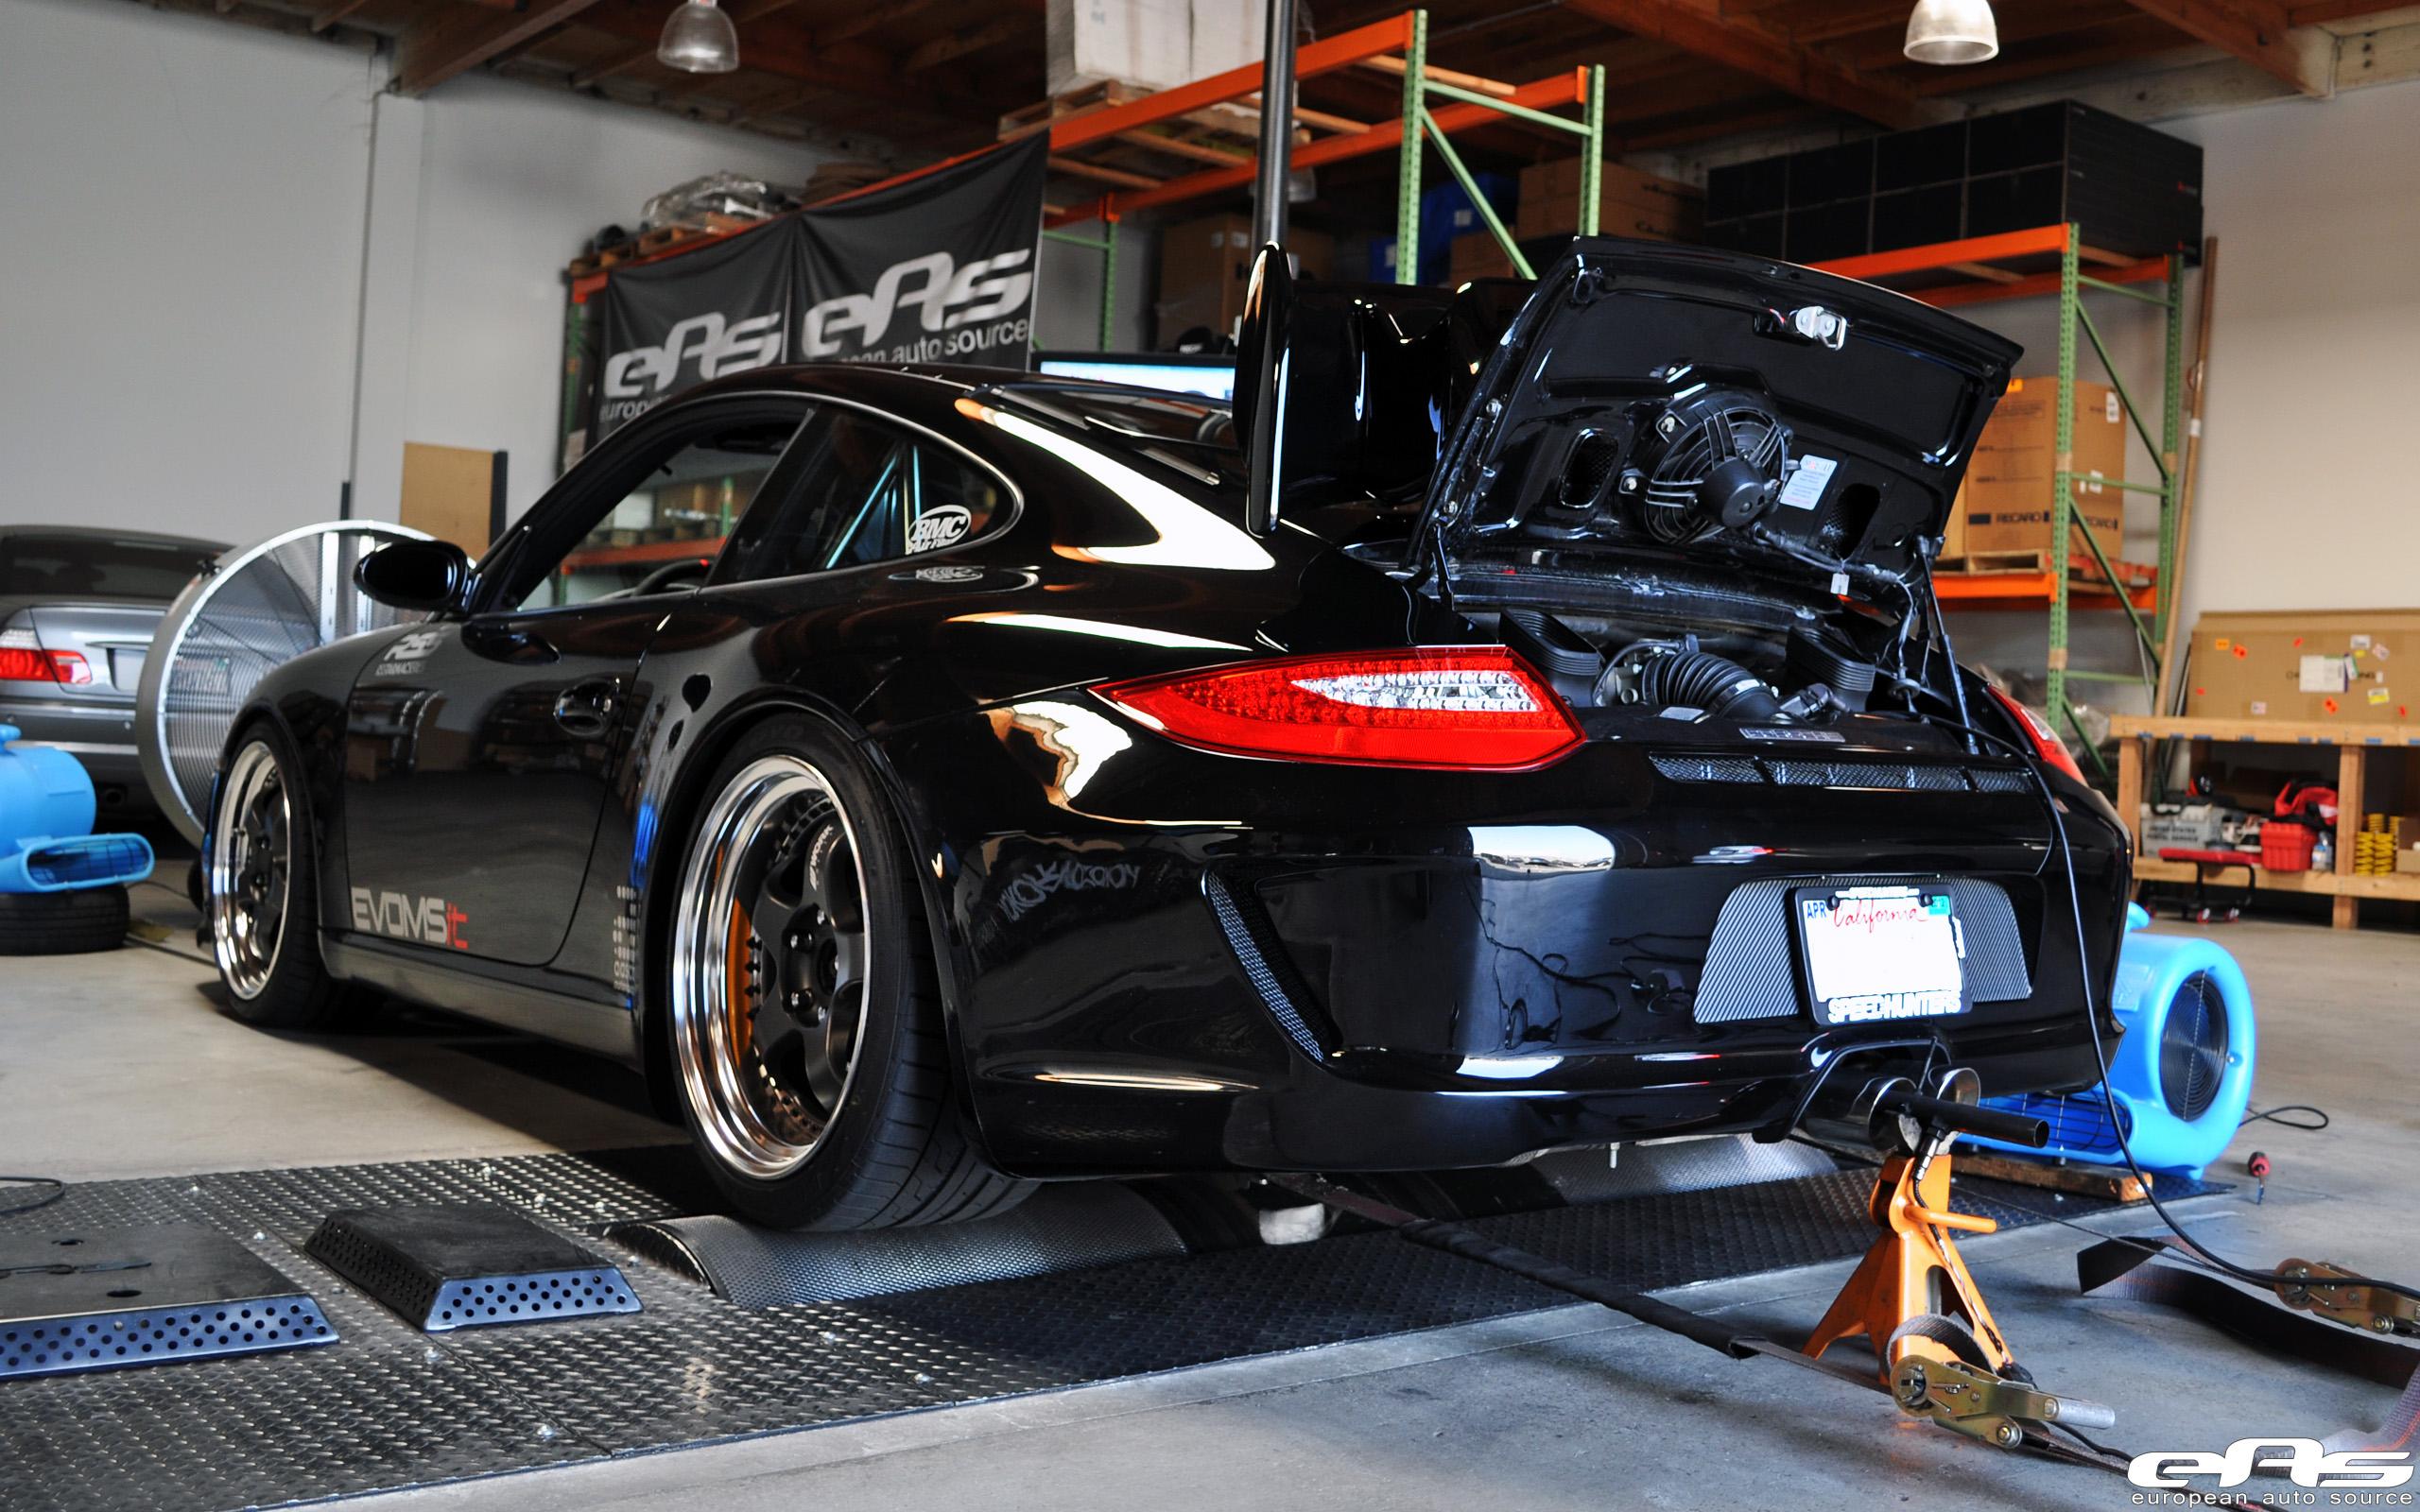 Jet Black Porsche 997 On The Dyno Bmw Performance Parts